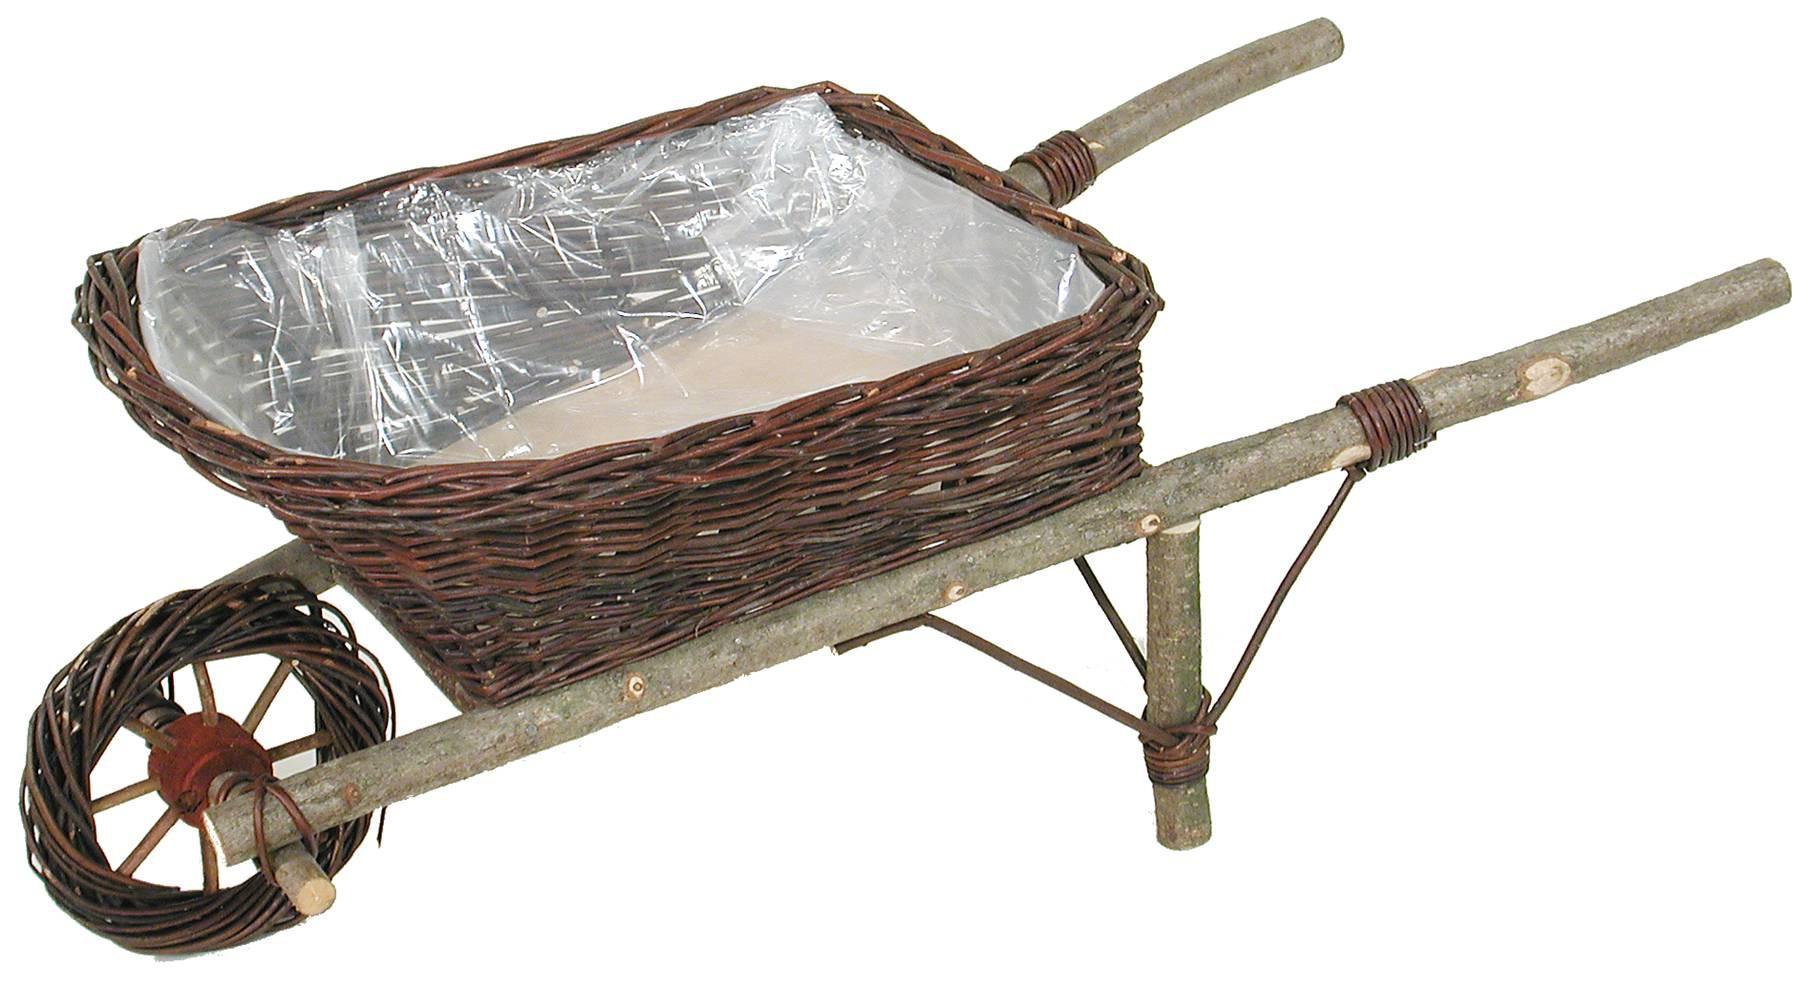 La Vannerie D'aujourd'hui - Jardinière Brouette Décorative Osier Brut serapportantà Brouette Deco Jardin